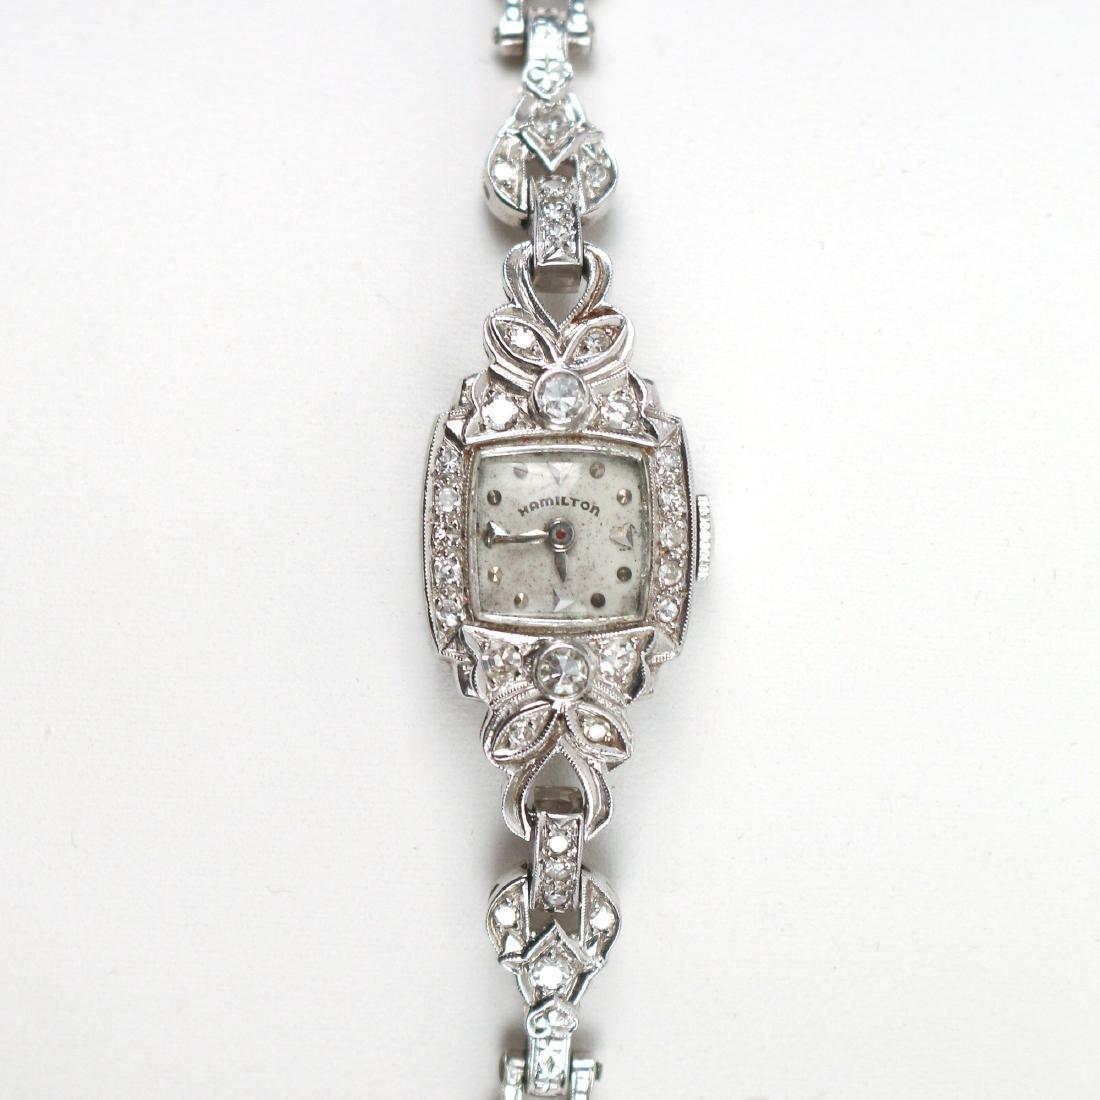 LADY'S PLATINUM & DIAMOND WRISTWATCH